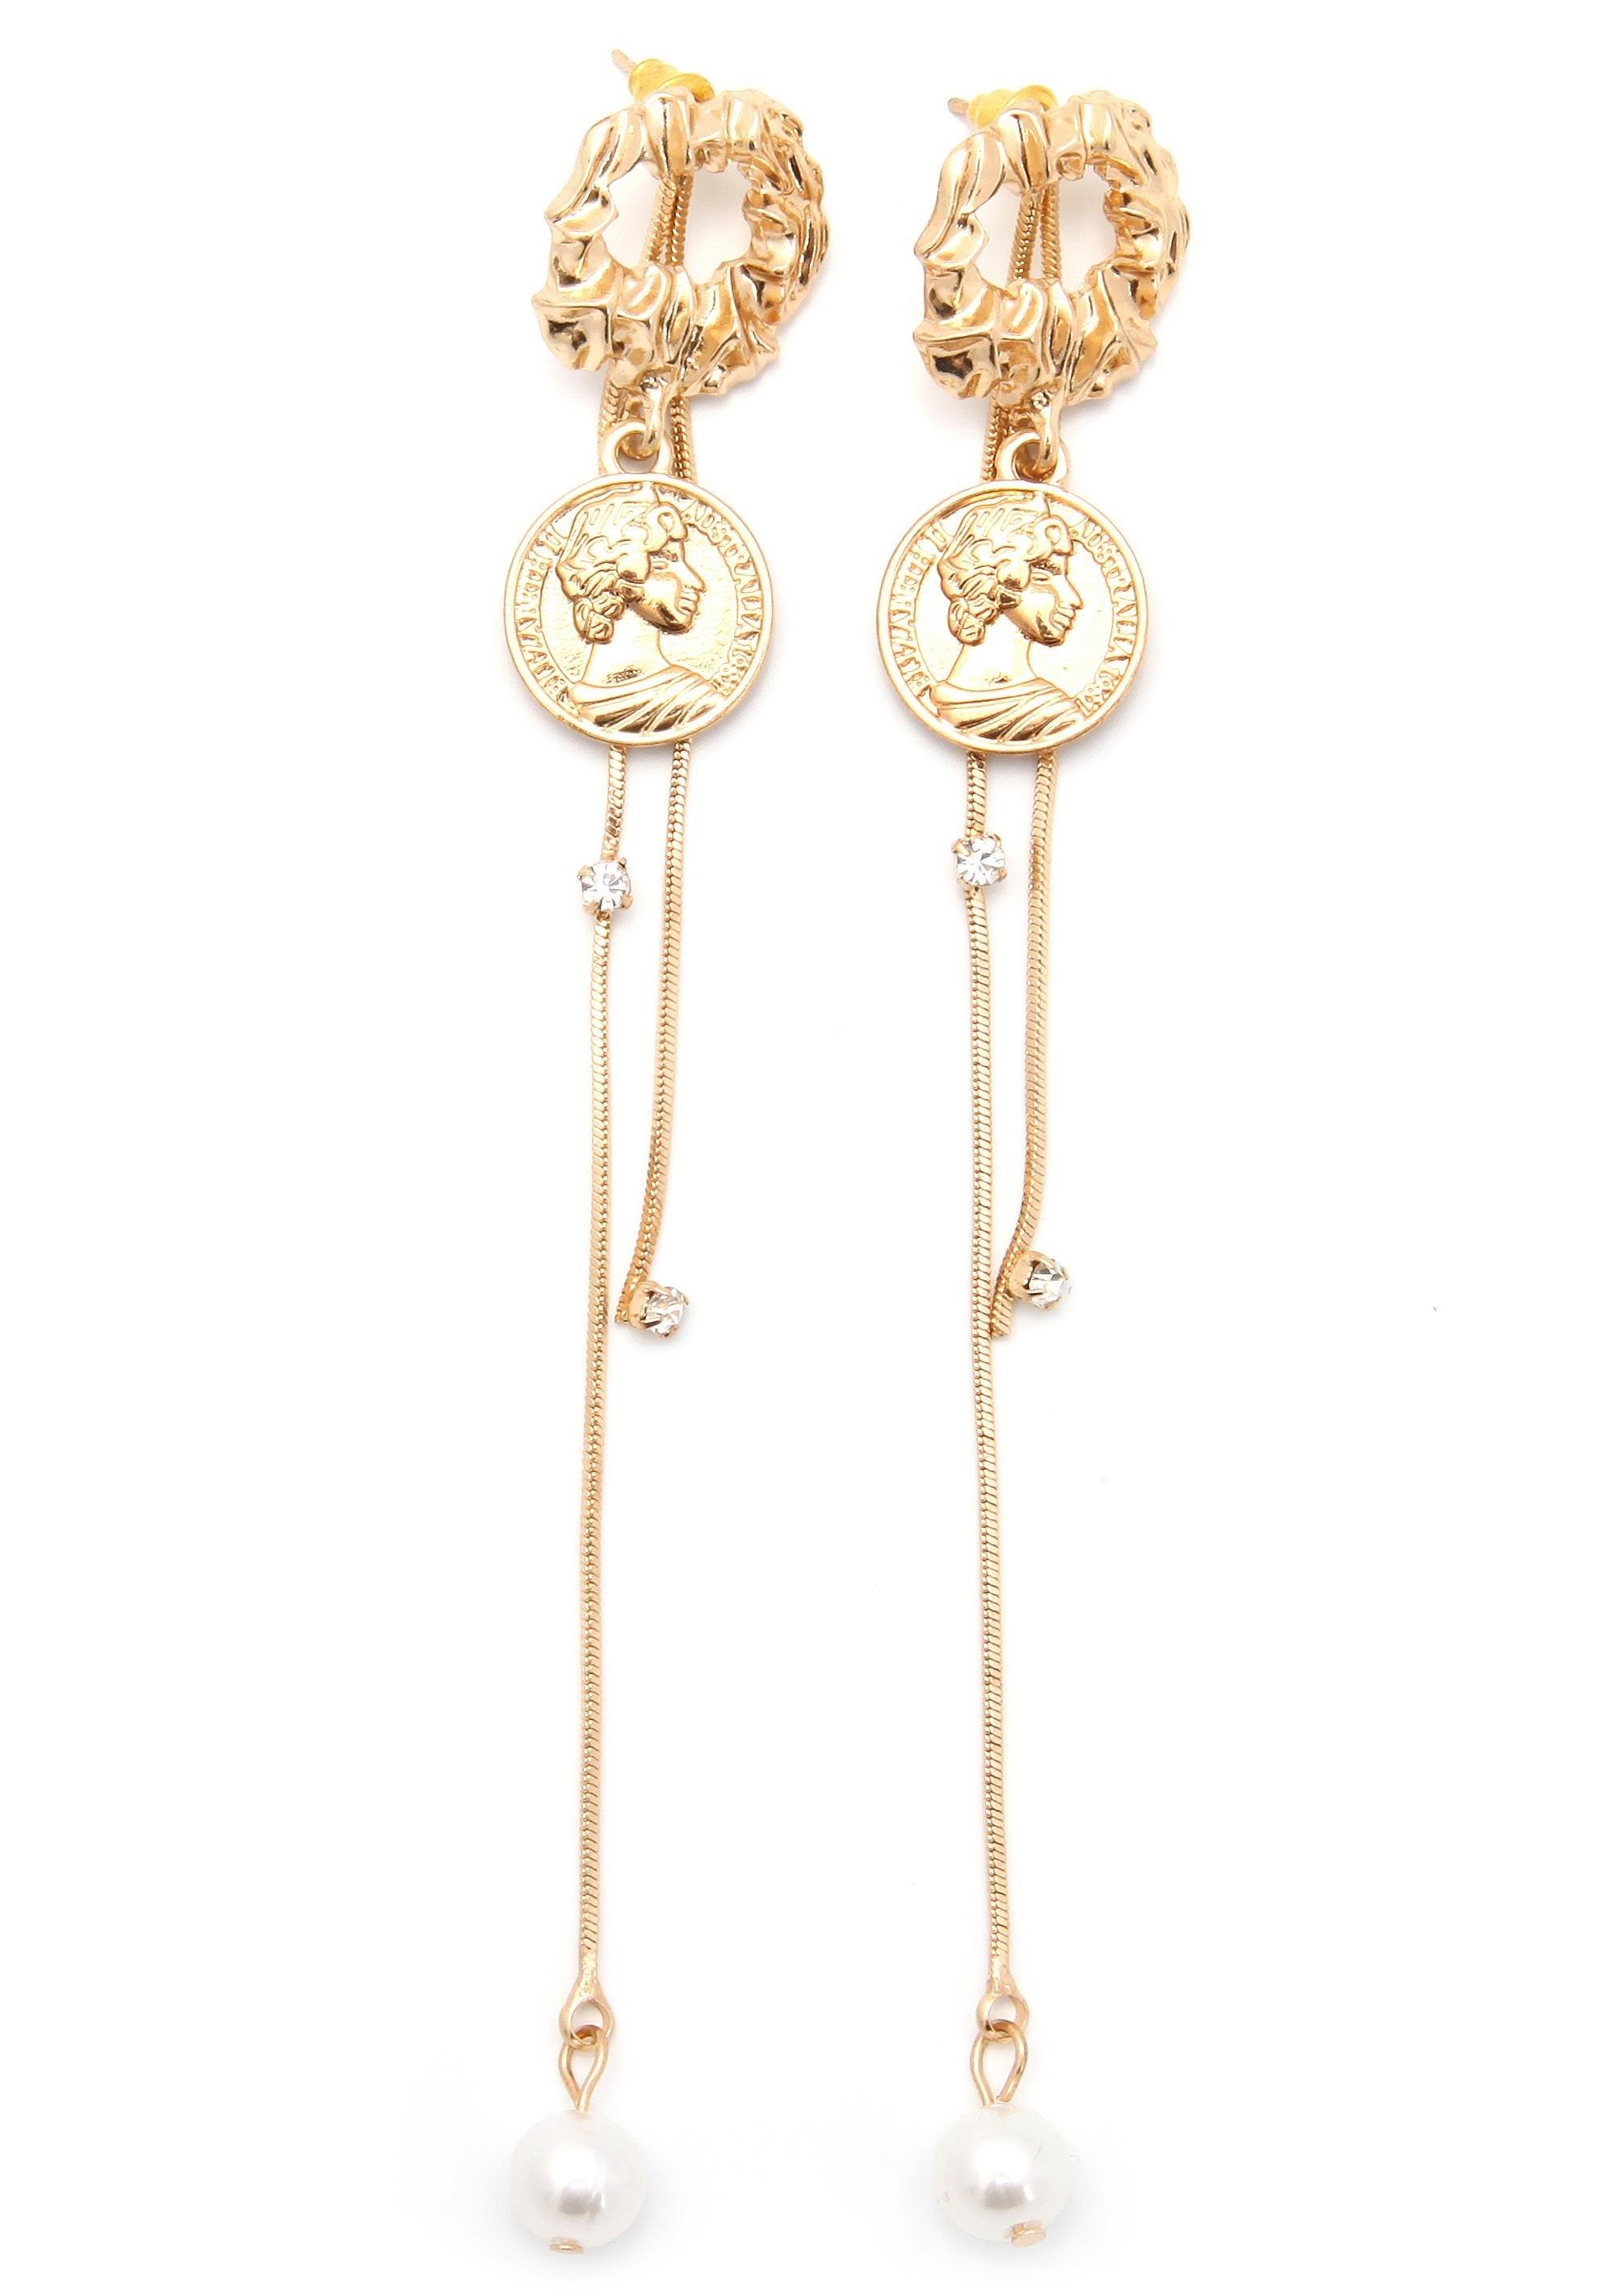 J JAYZ oorstekers »mit Münzen, glamourös, vergoldet« bij OTTO online kopen